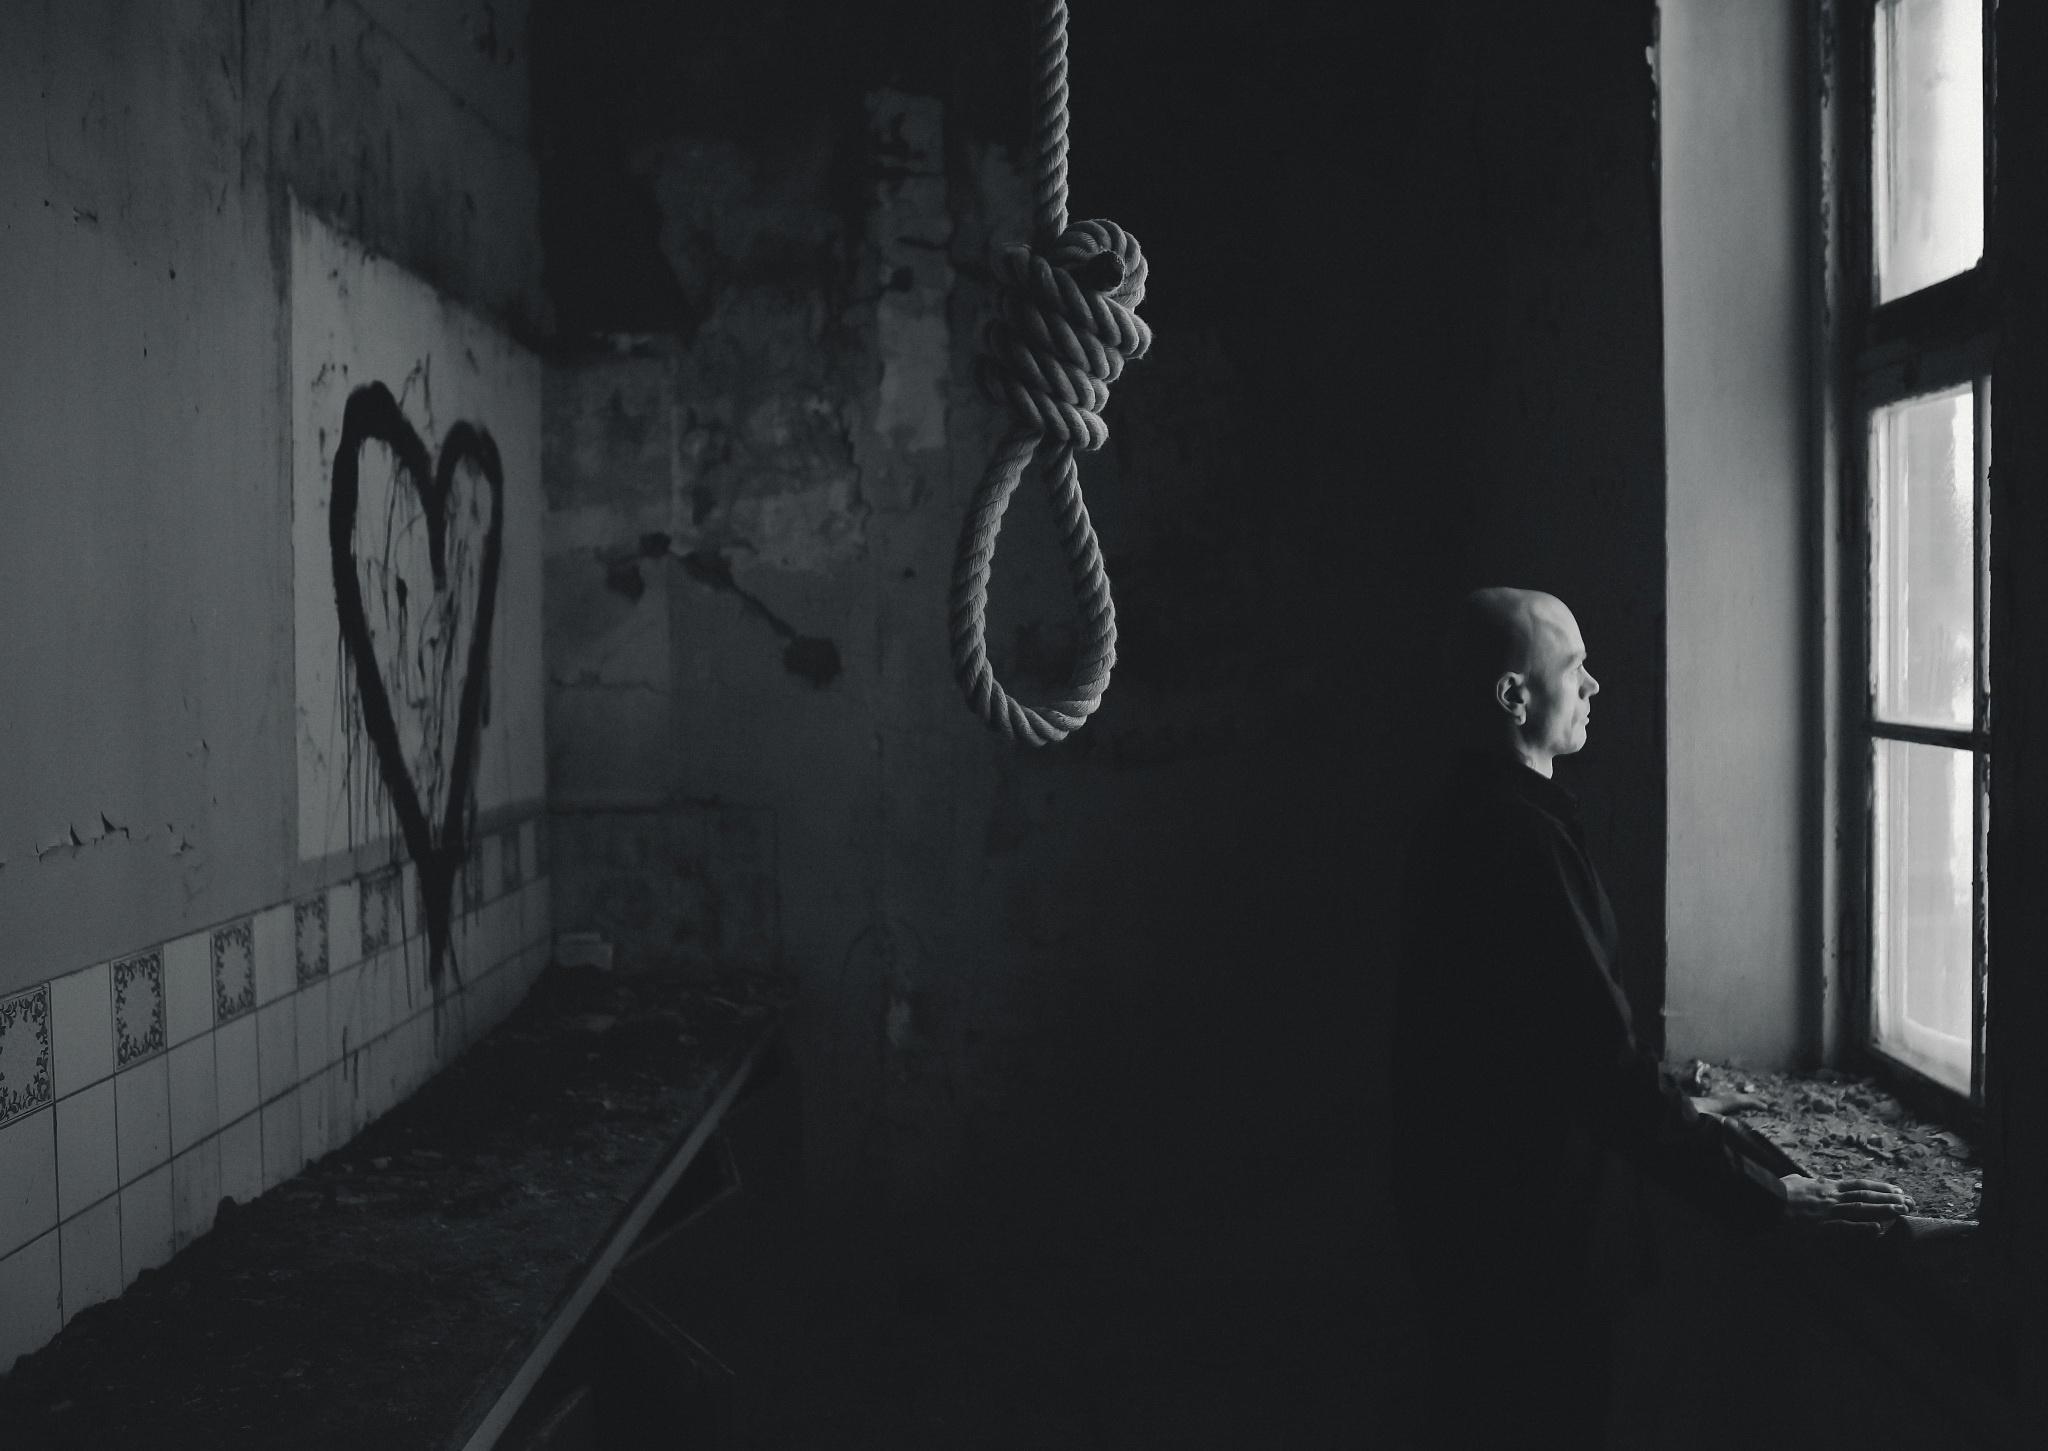 suicide men dark depressing